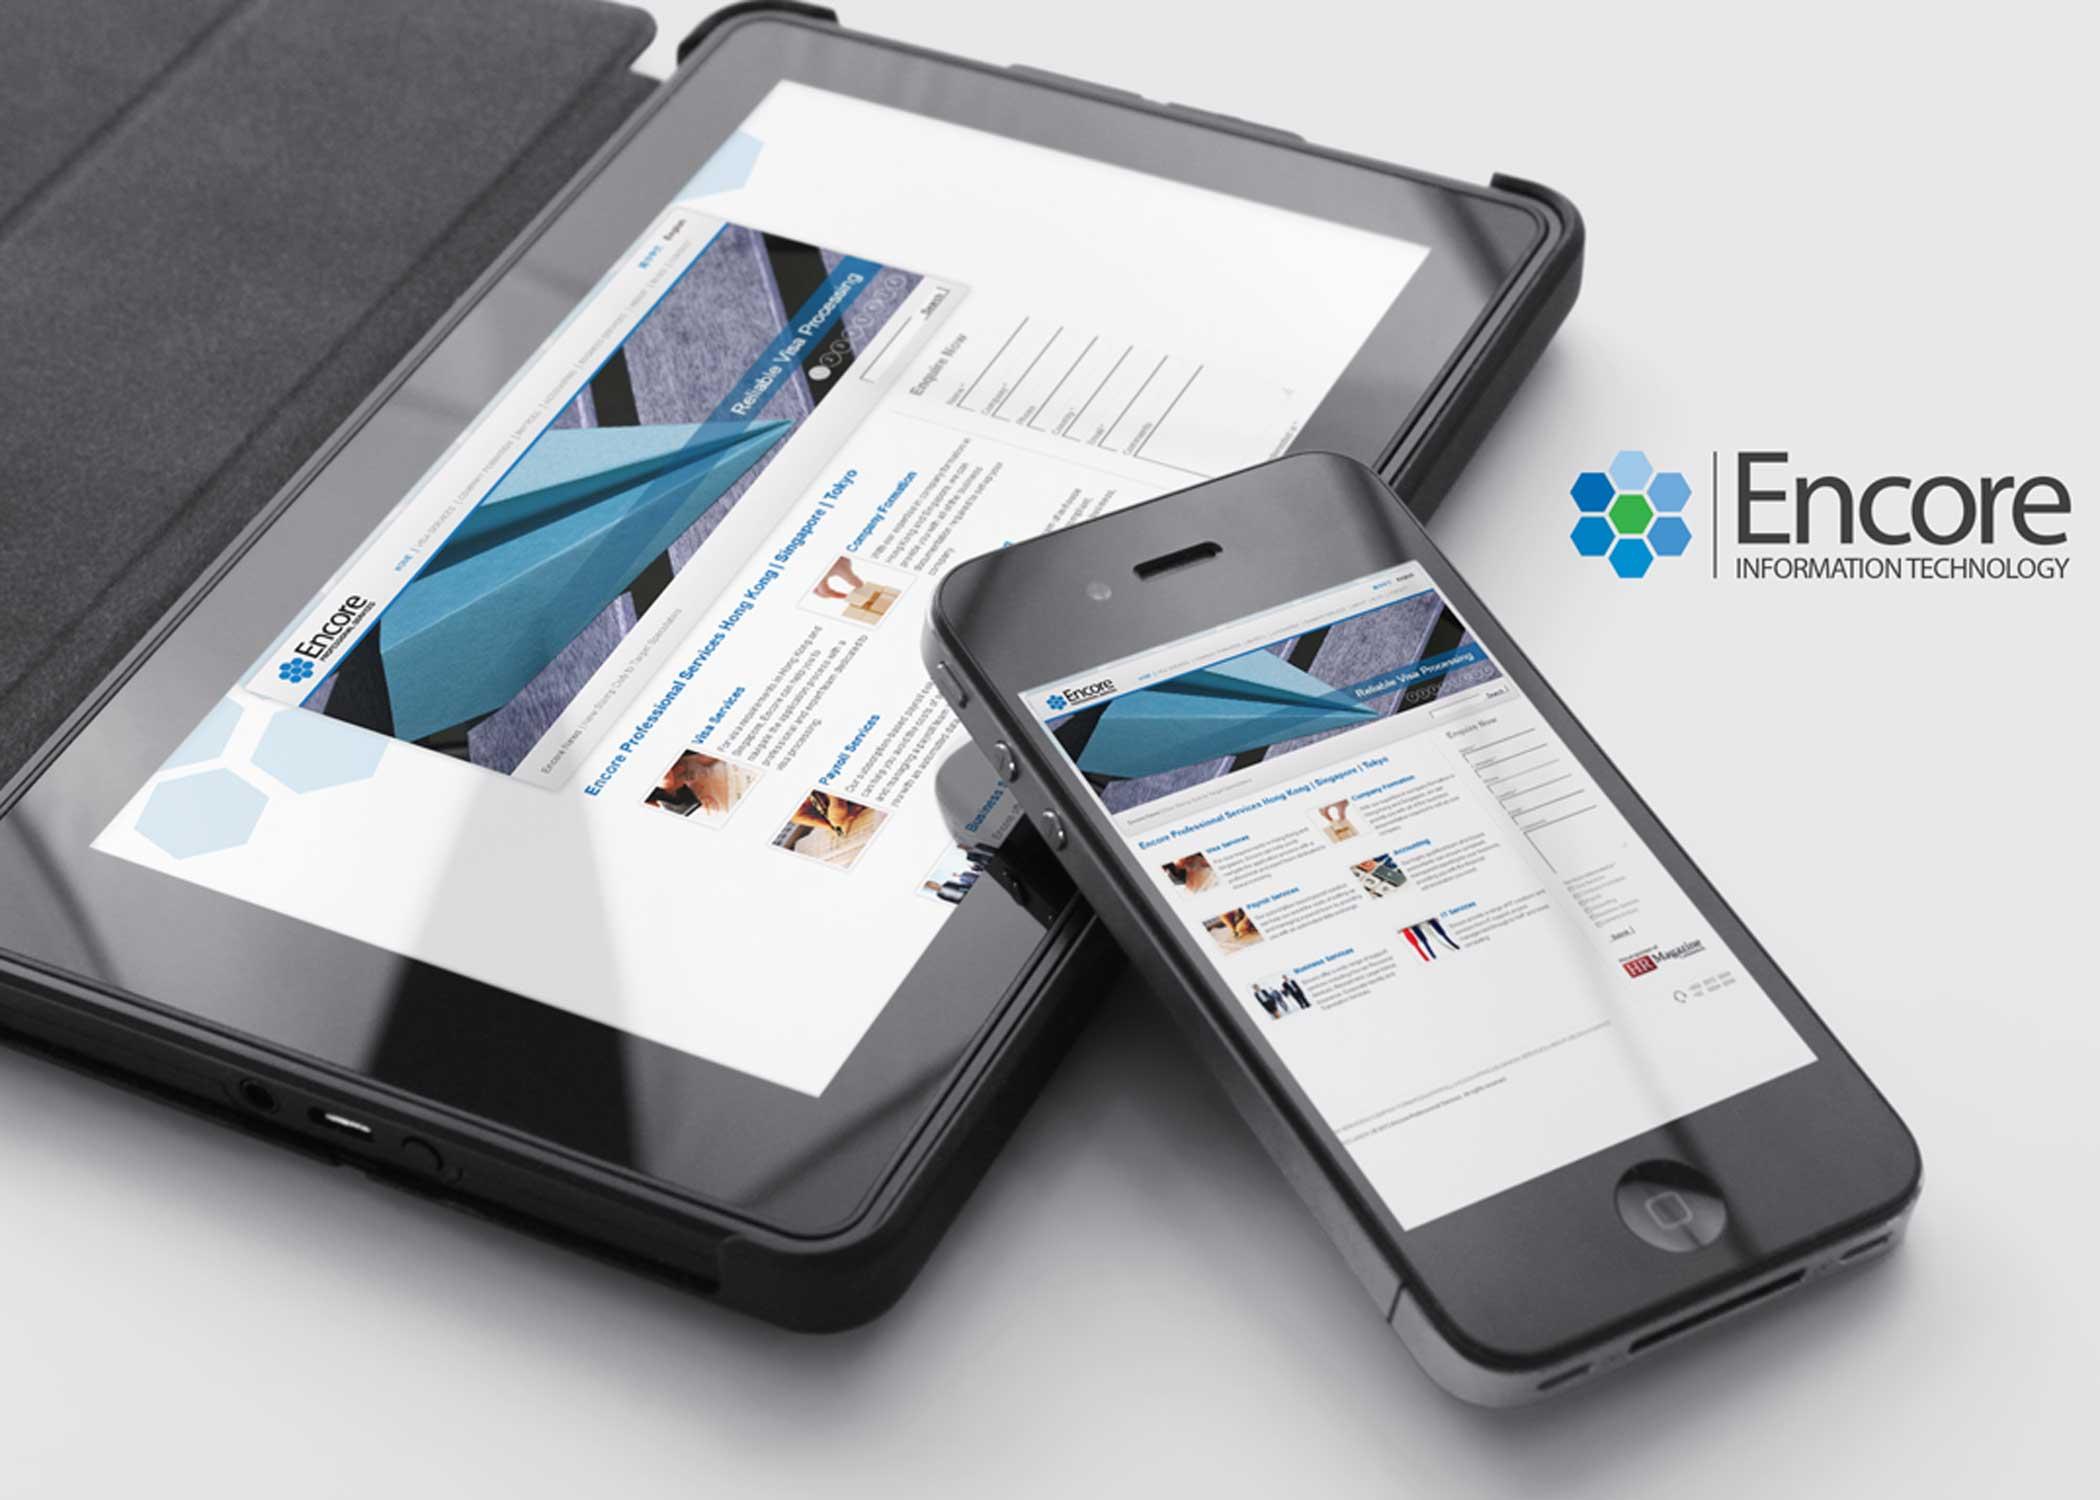 Logo_Encore-Professional-Services_www.encorepro.com_dian-hasan-branding_HK-SG-JP-7